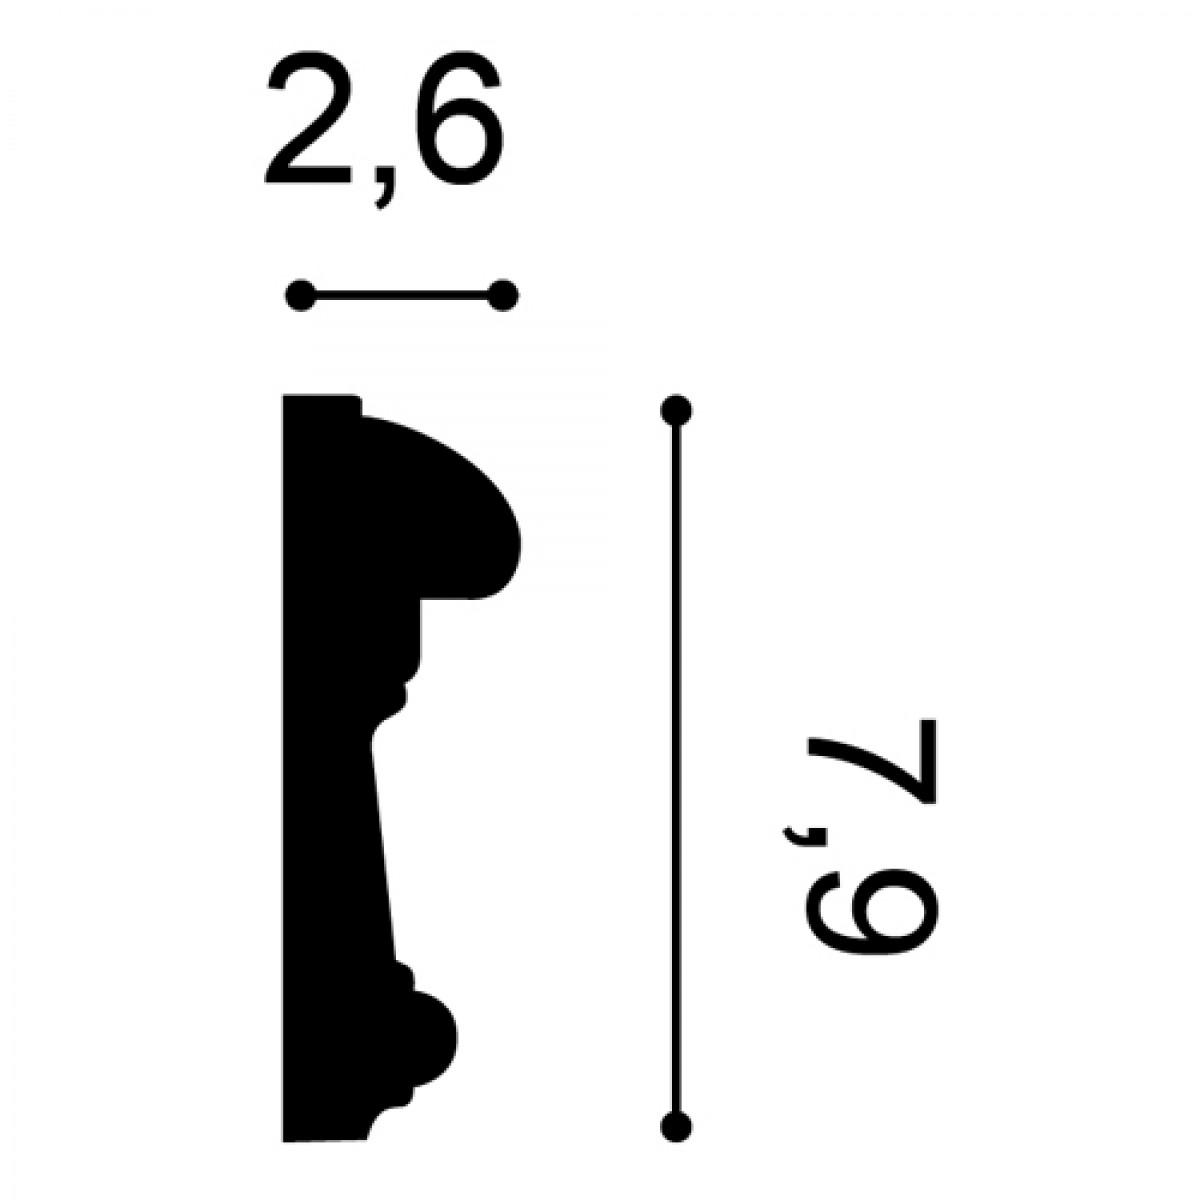 Brau Luxxus P7040, Dimensiuni: 200 X 7.9 X 2.6 cm, Orac Decor